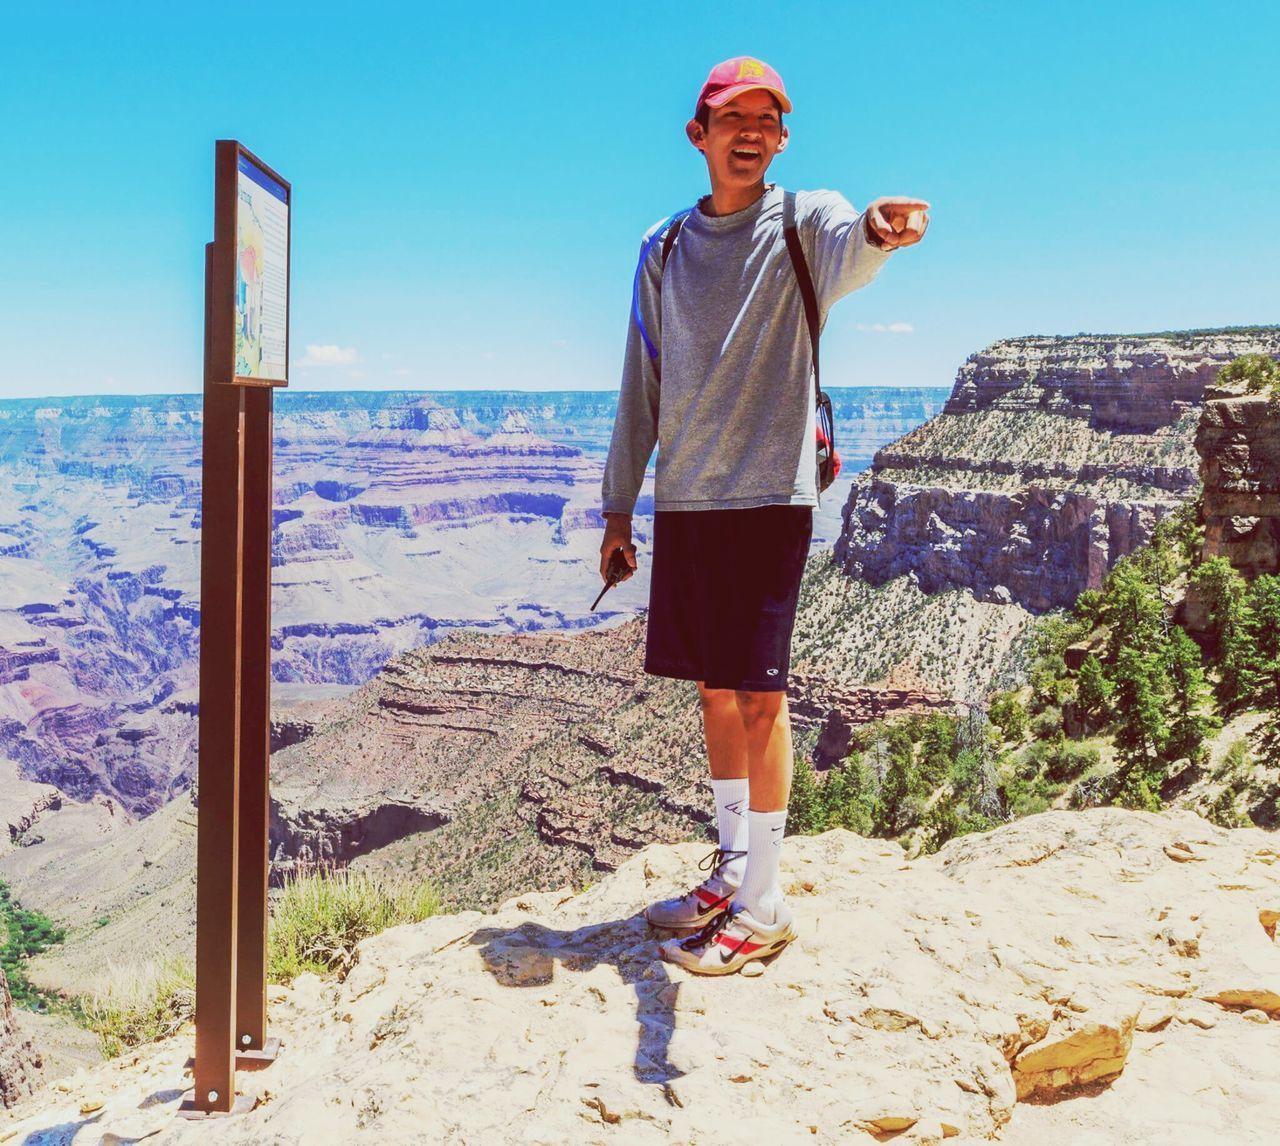 Me at the Grand Canyon. Standing One Person Outdoors Nature Day Grandcanyonnationalpark Grandcanyon Arizona Canyons Self Portrait